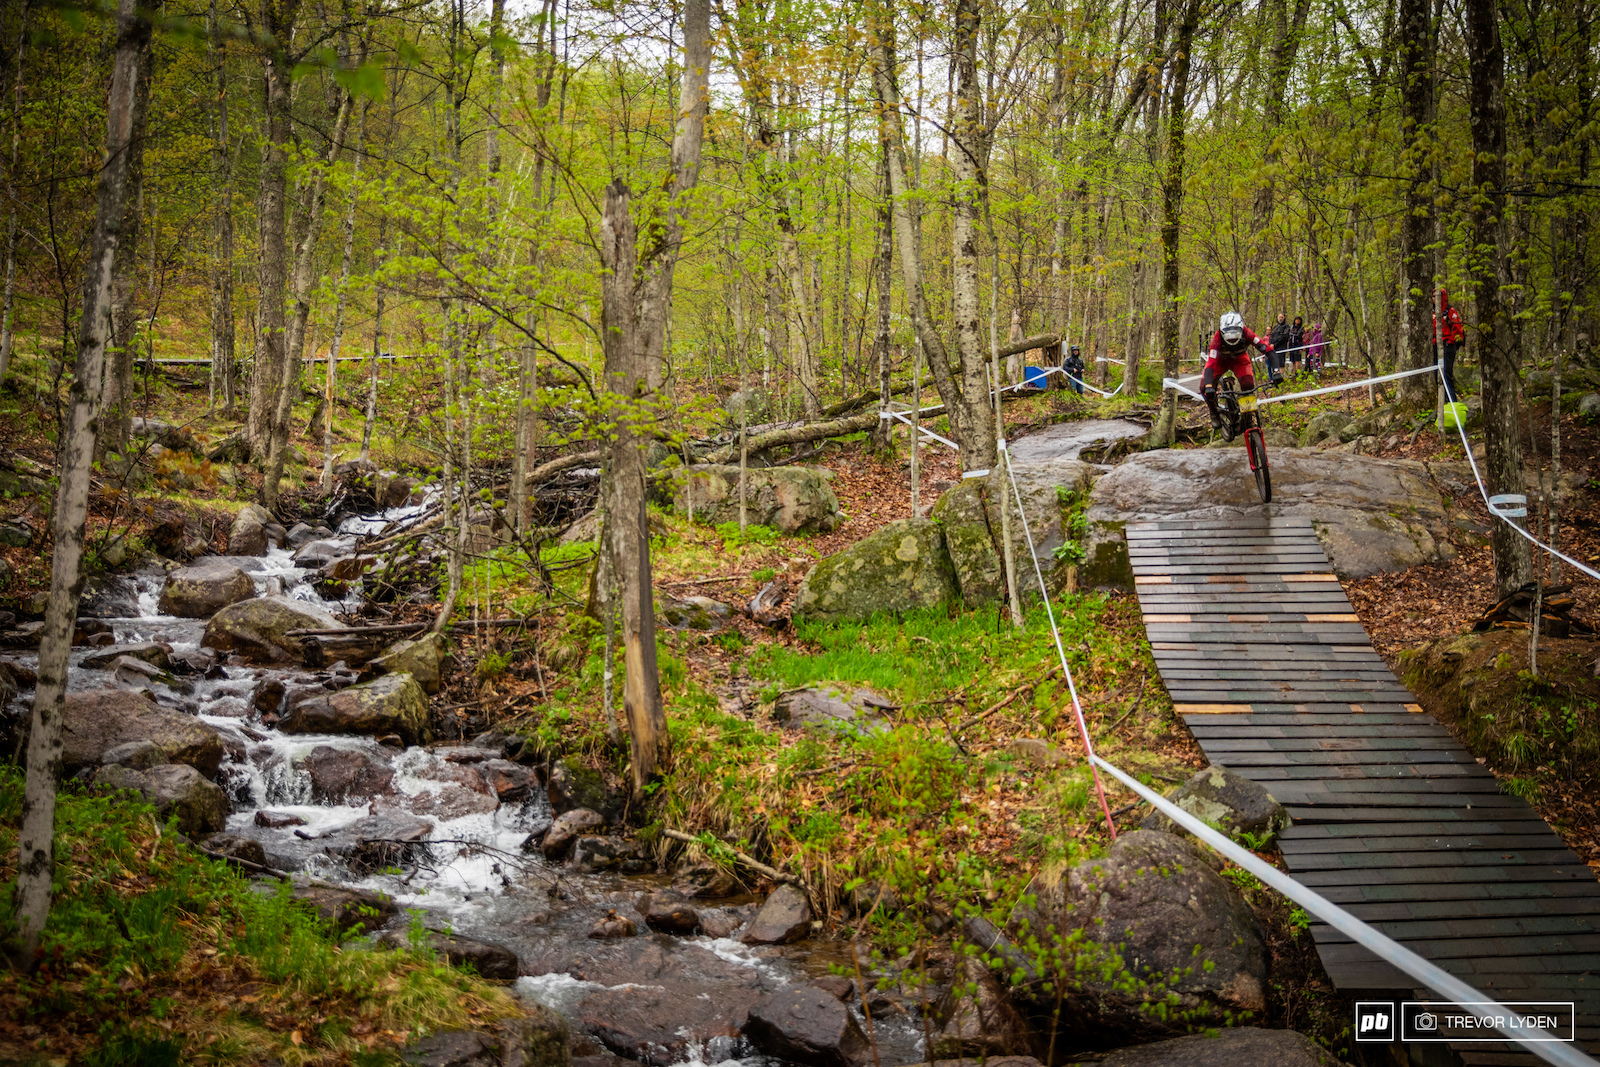 A flowing creek alongside the downhill track.